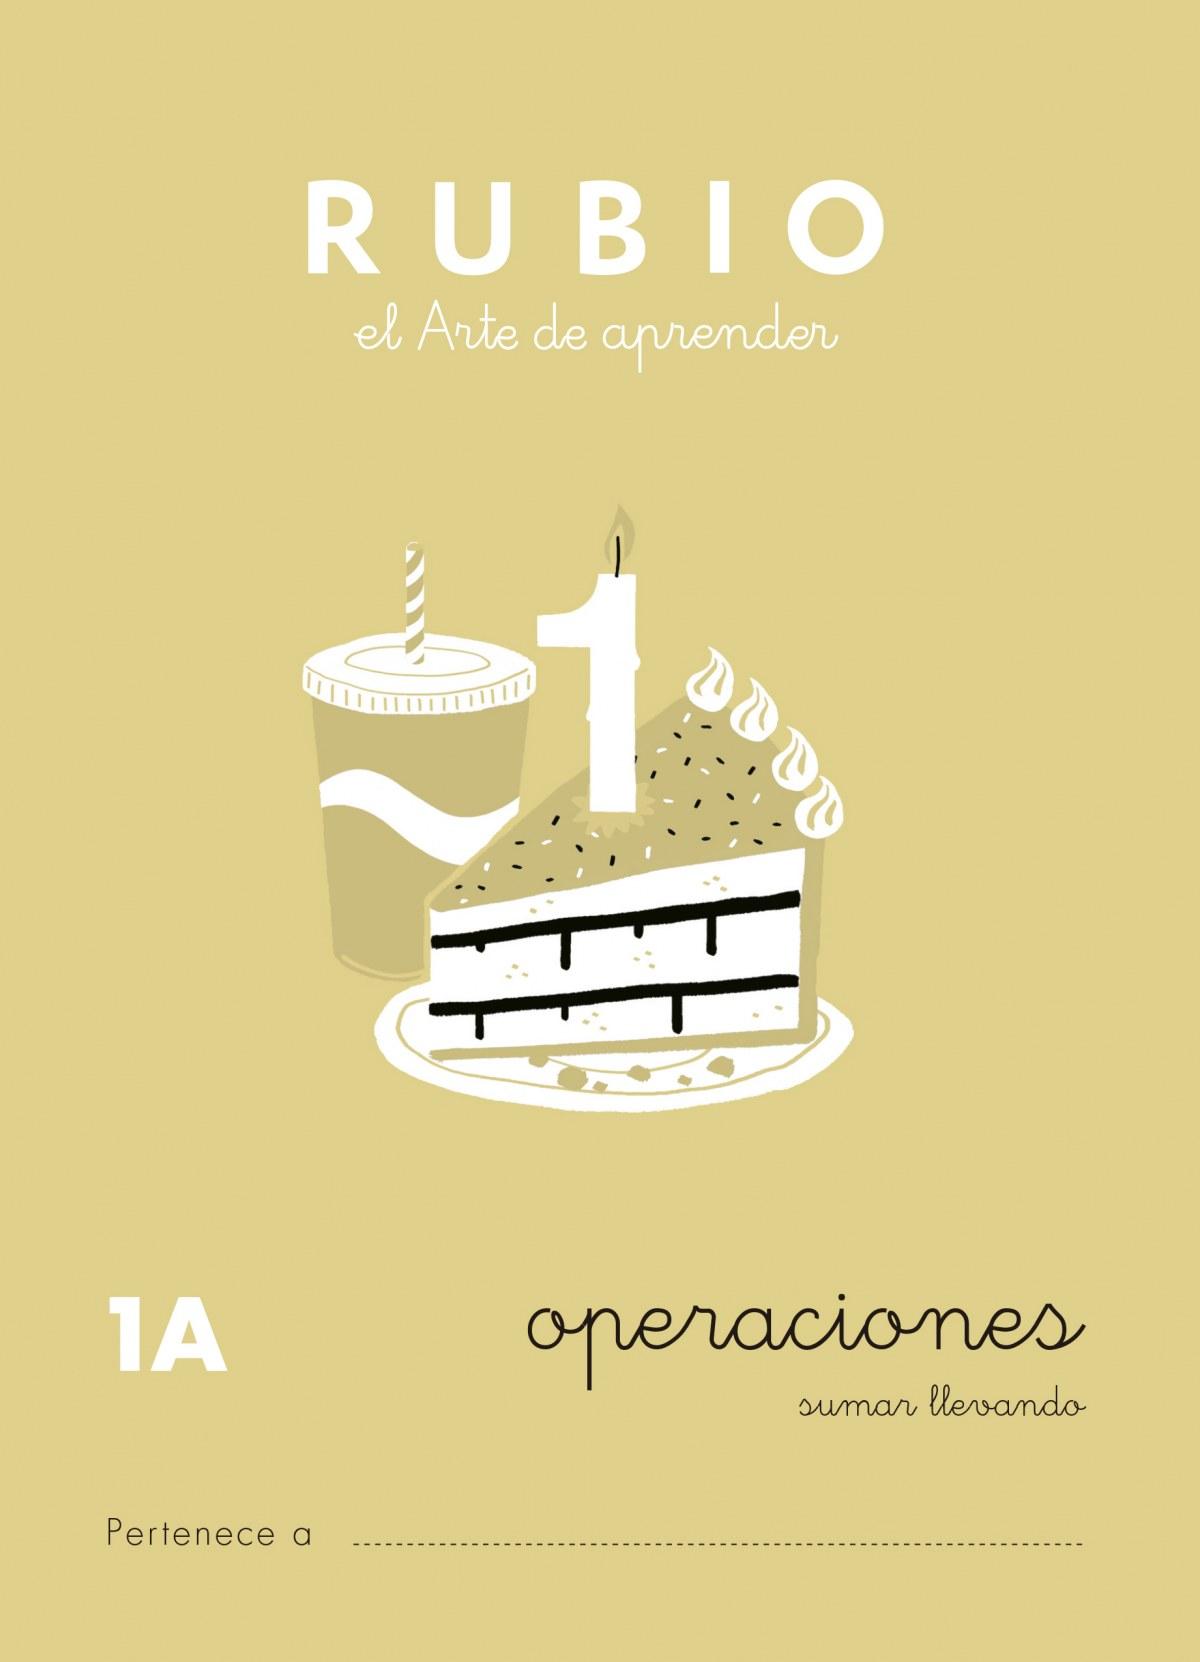 Problemas Rubio, n 1A 9788485109517